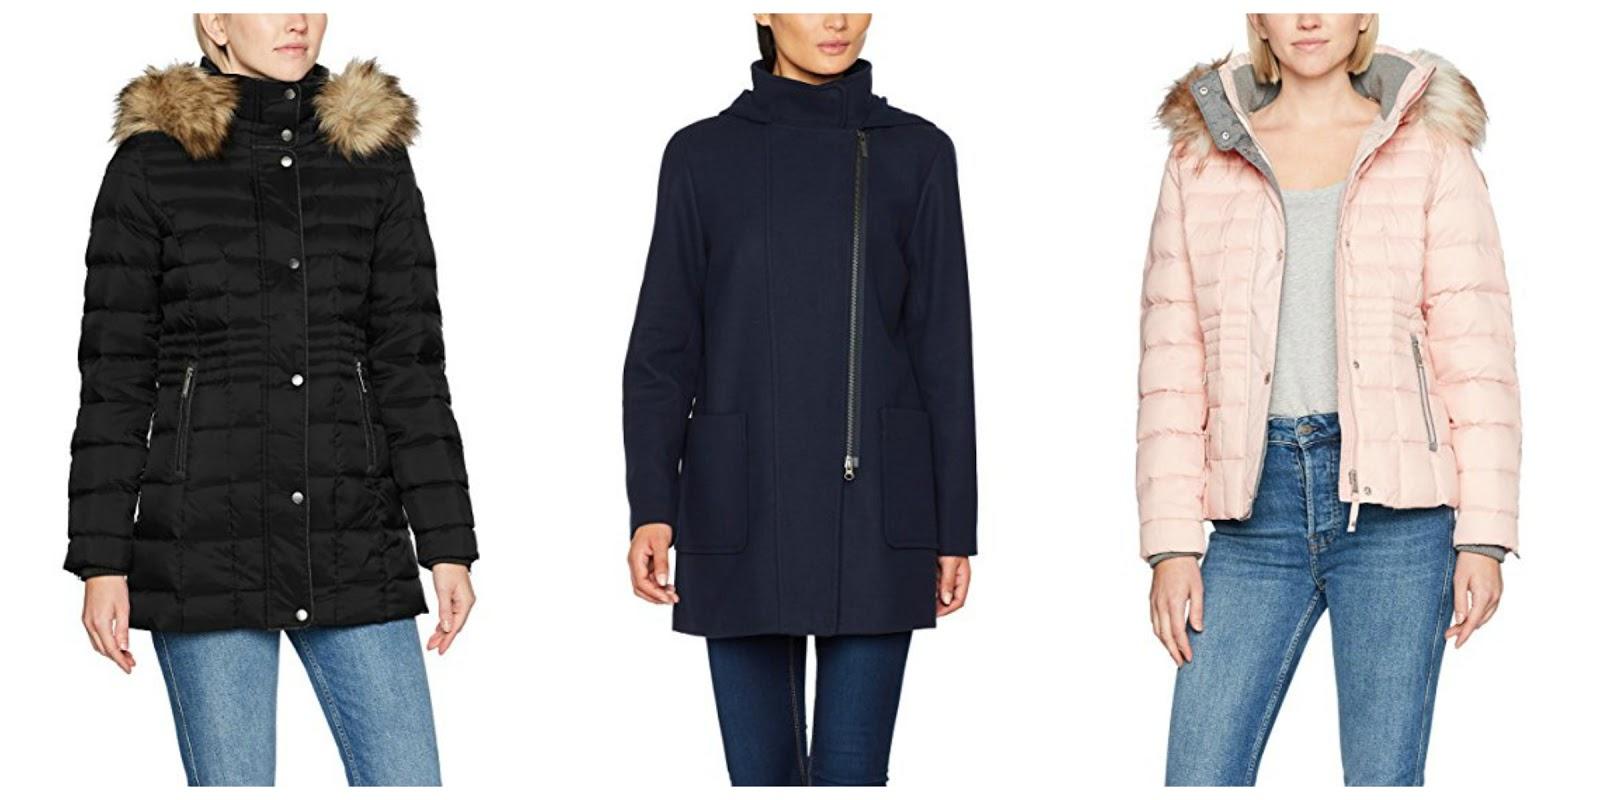 Outlet Store Verkauf Modestil Ausverkauf Stilvolle Kzpxiu 2018 – Trends Jacken Damen TF3lc1KJ